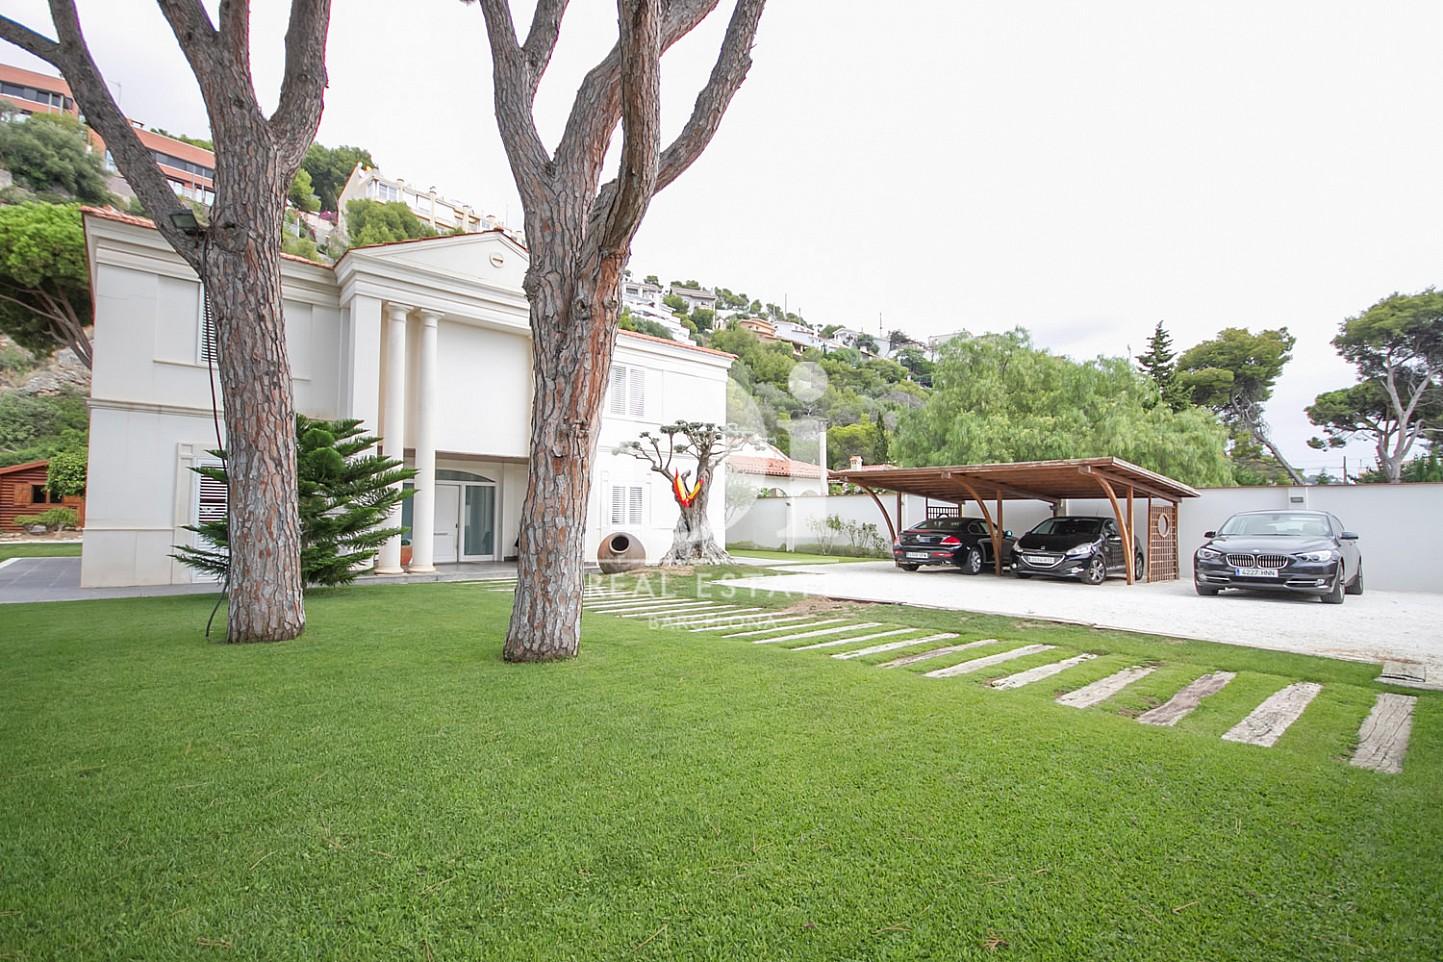 Gran jardí exterior i garatge